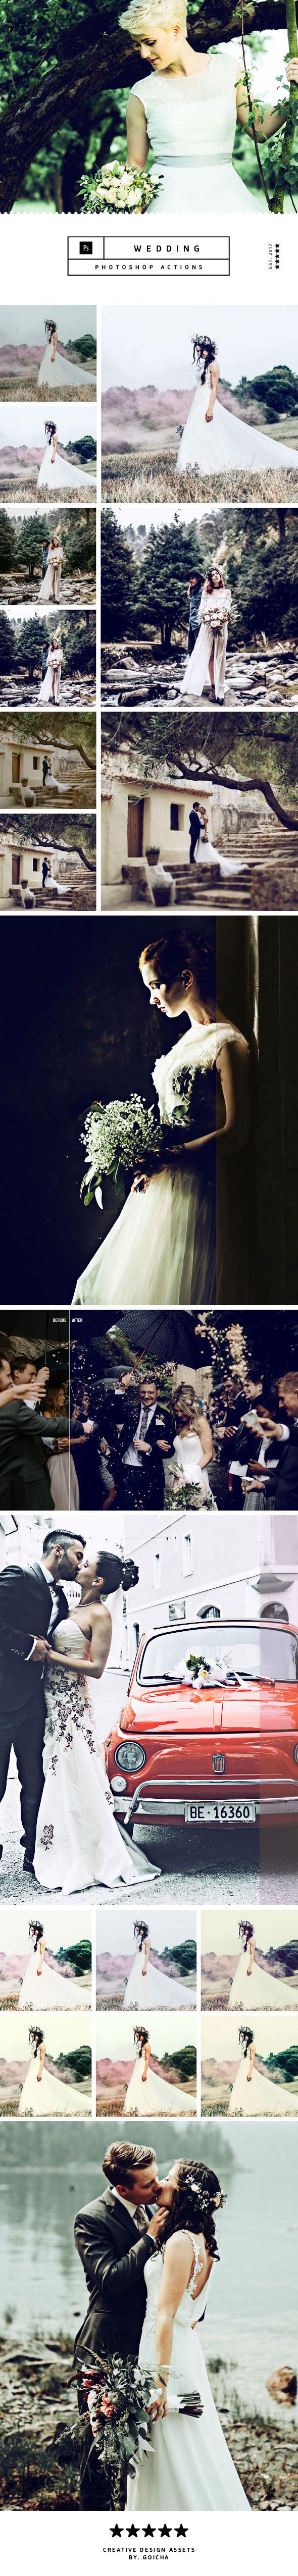 Wedding Photoshop Actions - Actions Photoshop